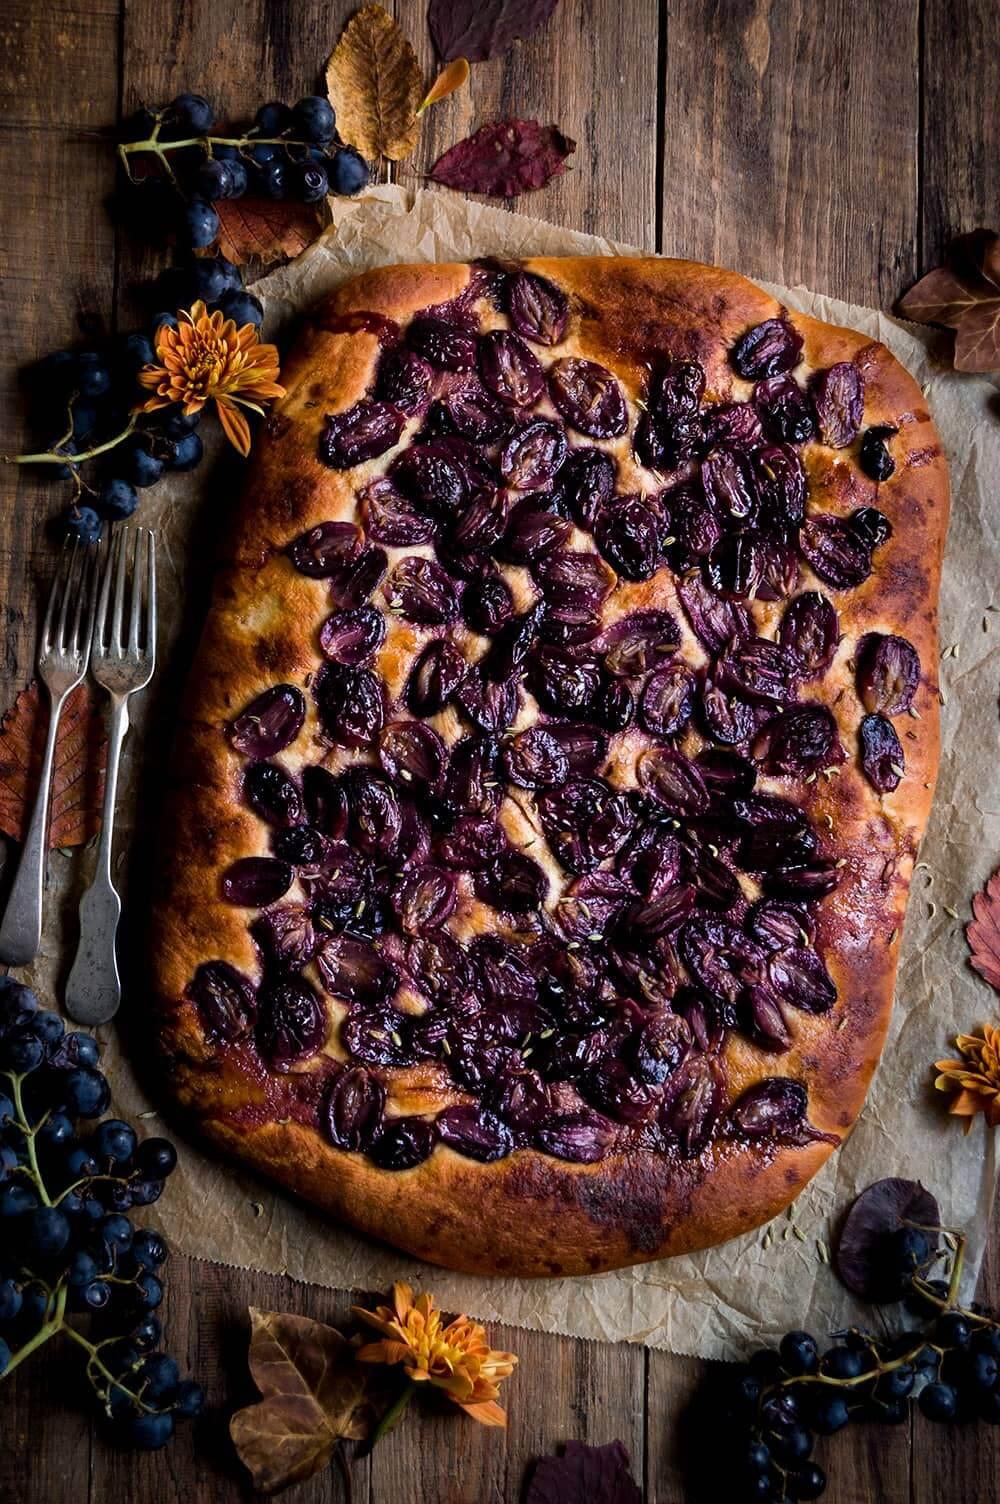 Schiacciata con uvas